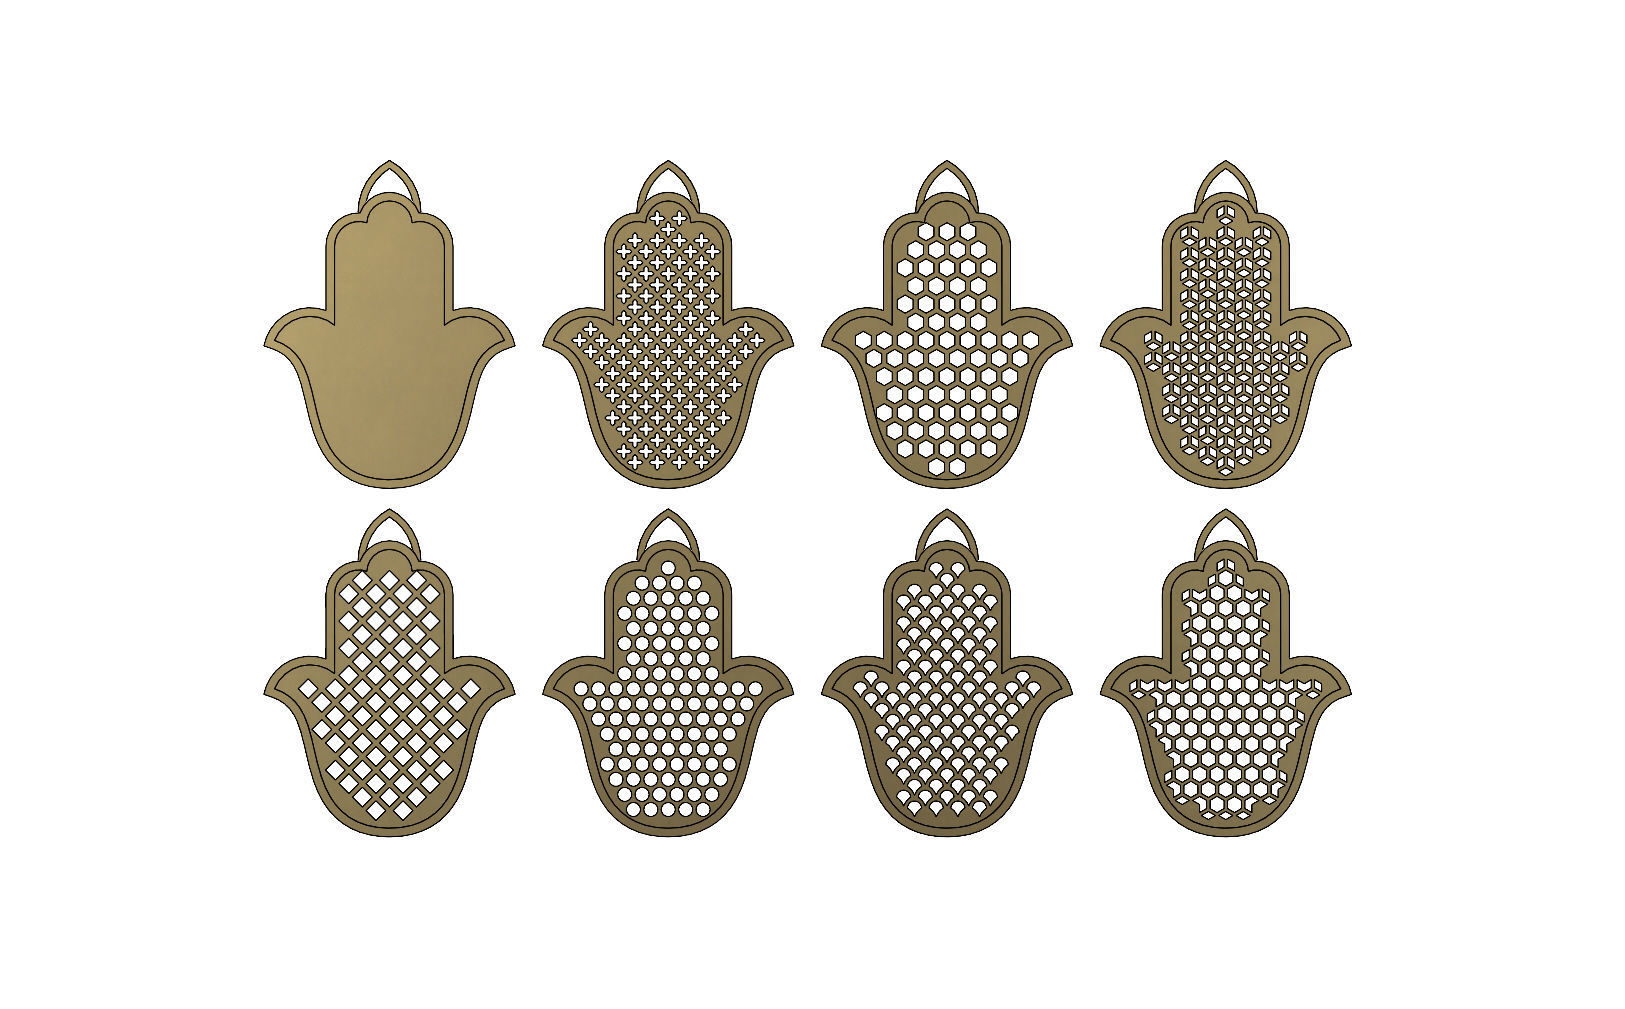 20 Flat Khamsa Khmissa beldi pendant with moucharabieh patterns